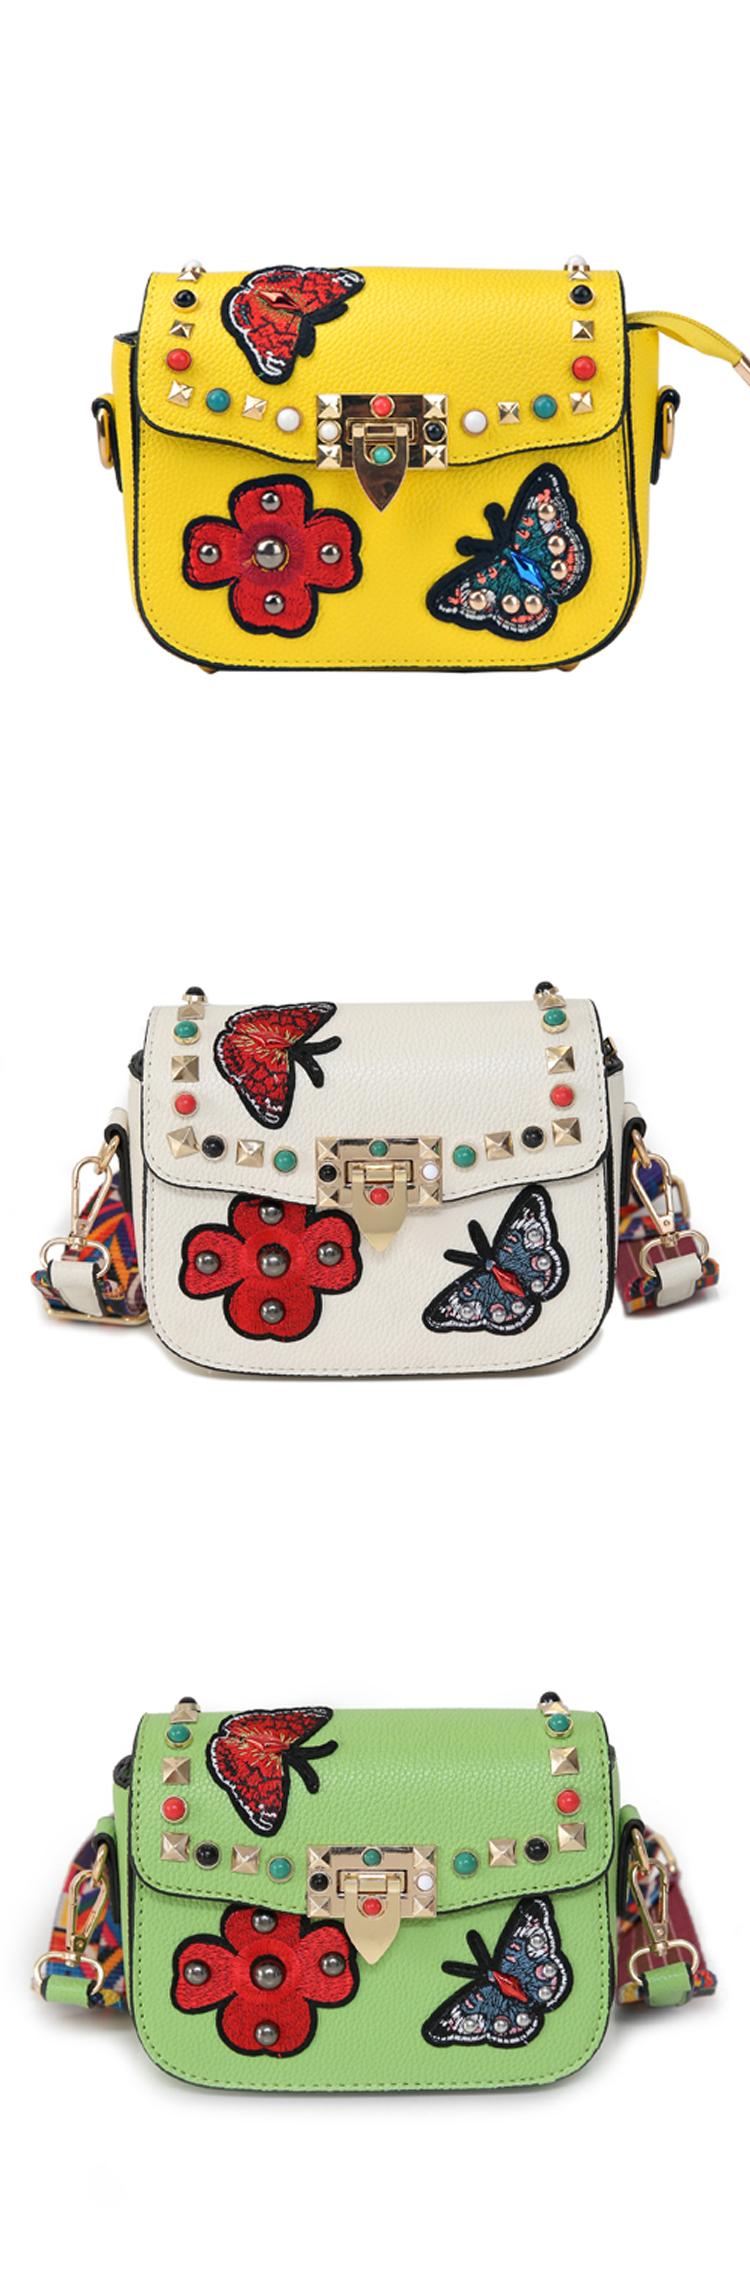 SAJOSE Women Small Hand Bag Flowers Designer Leather Shoulder Woman's Fashion Messenger Lady Crossbody Luxury Handbag Women Bags 4